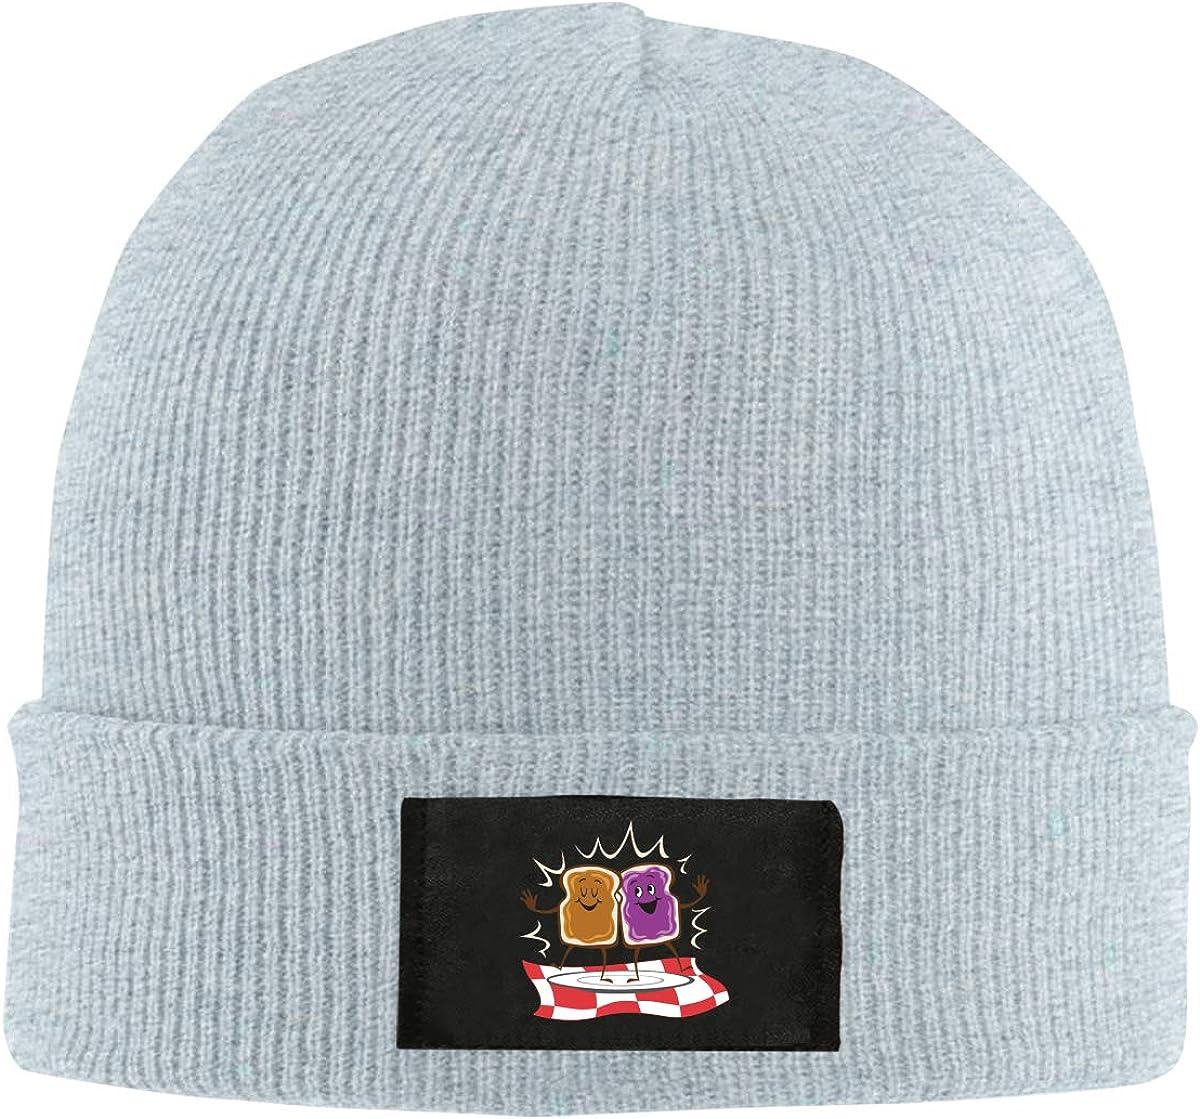 Peanut Butter and Jelly Logo Top Level Beanie Men Women Unisex Stylish Slouch Beanie Hats Black